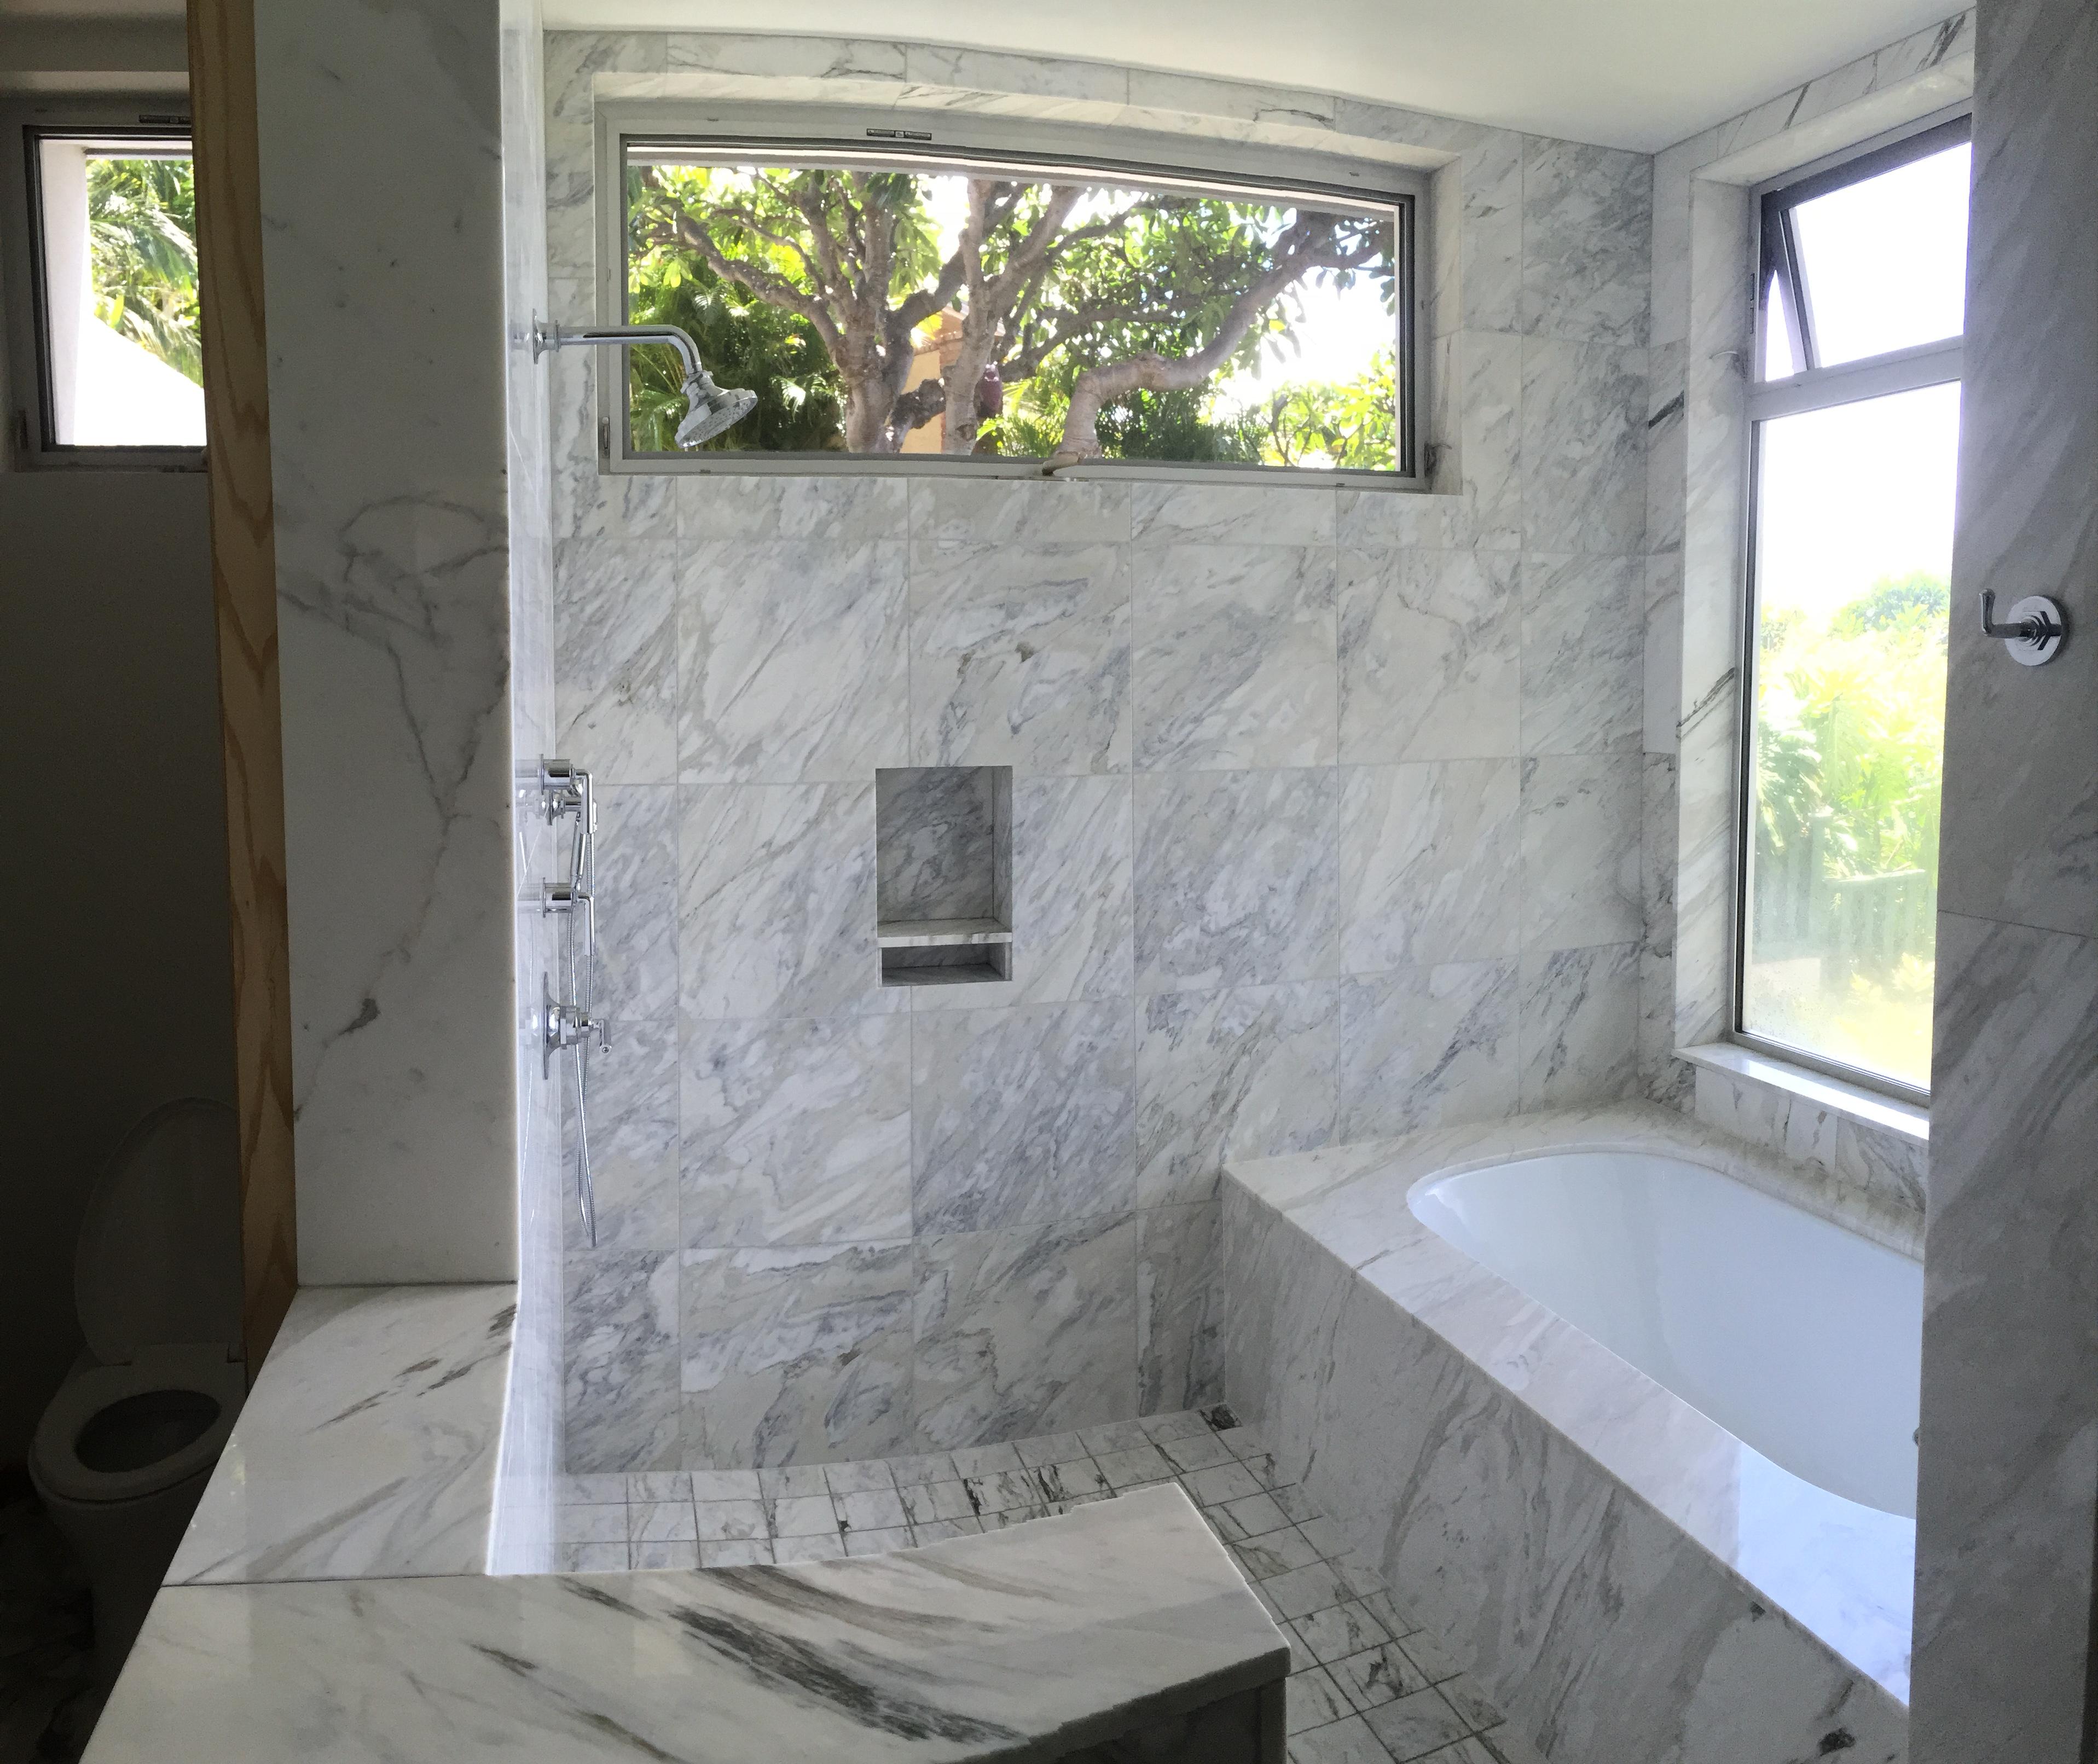 Home | Vladimir's Marble & Granite